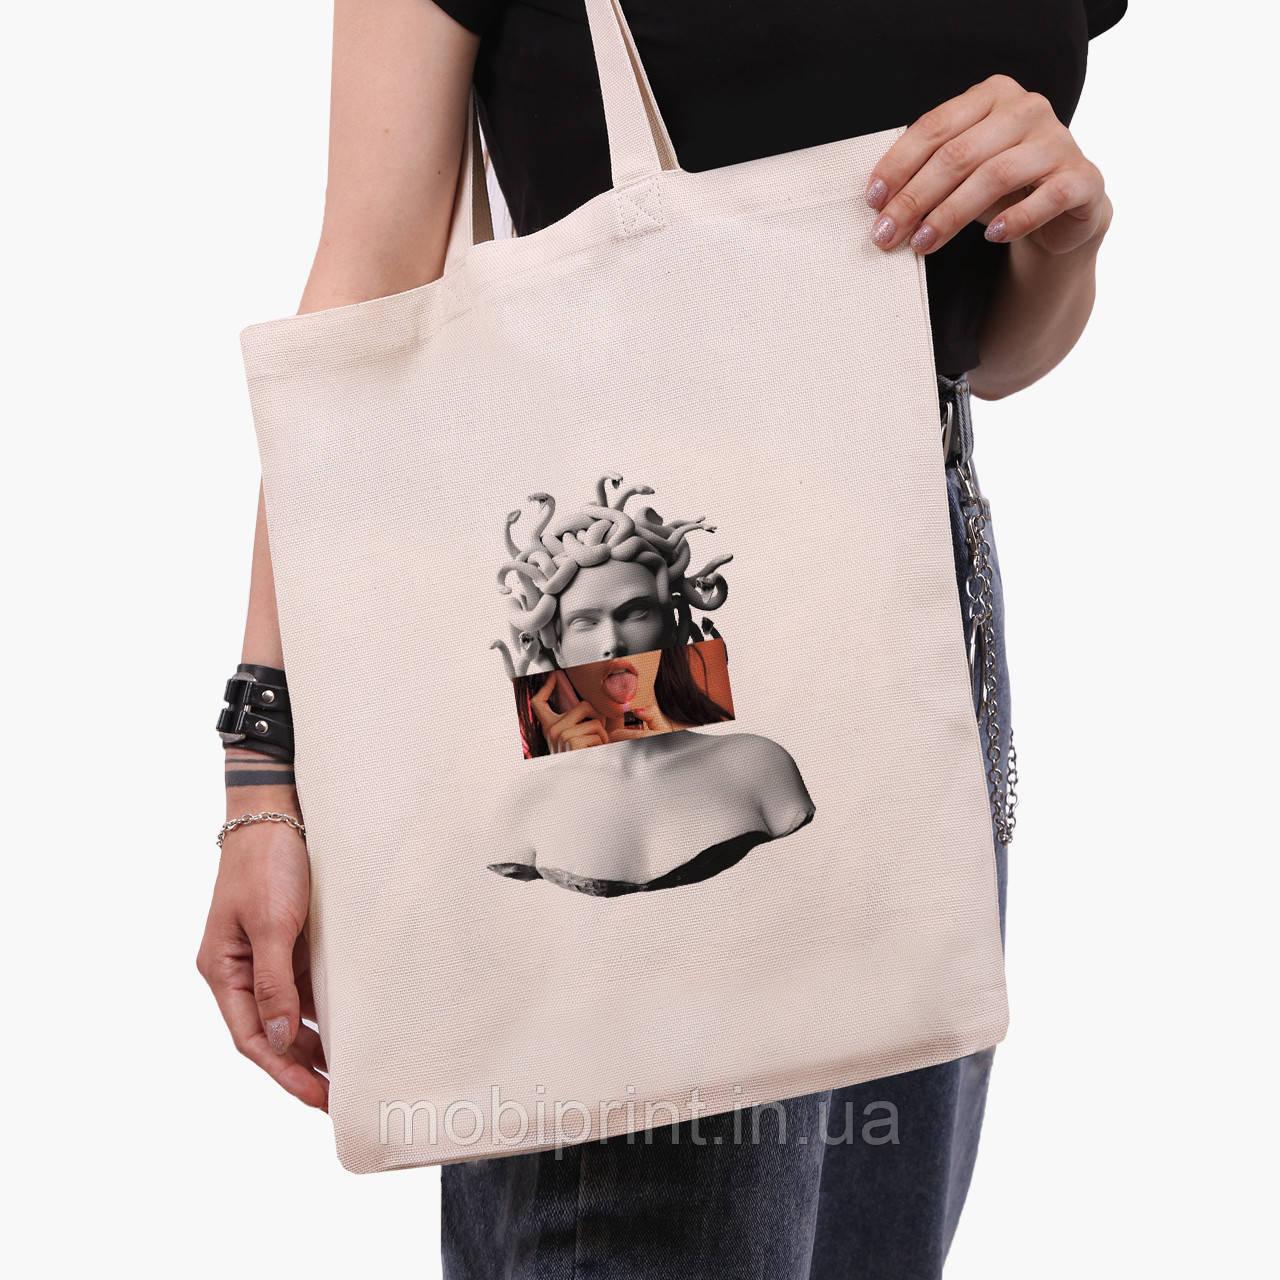 Эко сумка шоппер Меган Фокс - Ренессанс Медуза Горгона (Megan Fox) (9227-1203)  экосумка шопер 41*35 см